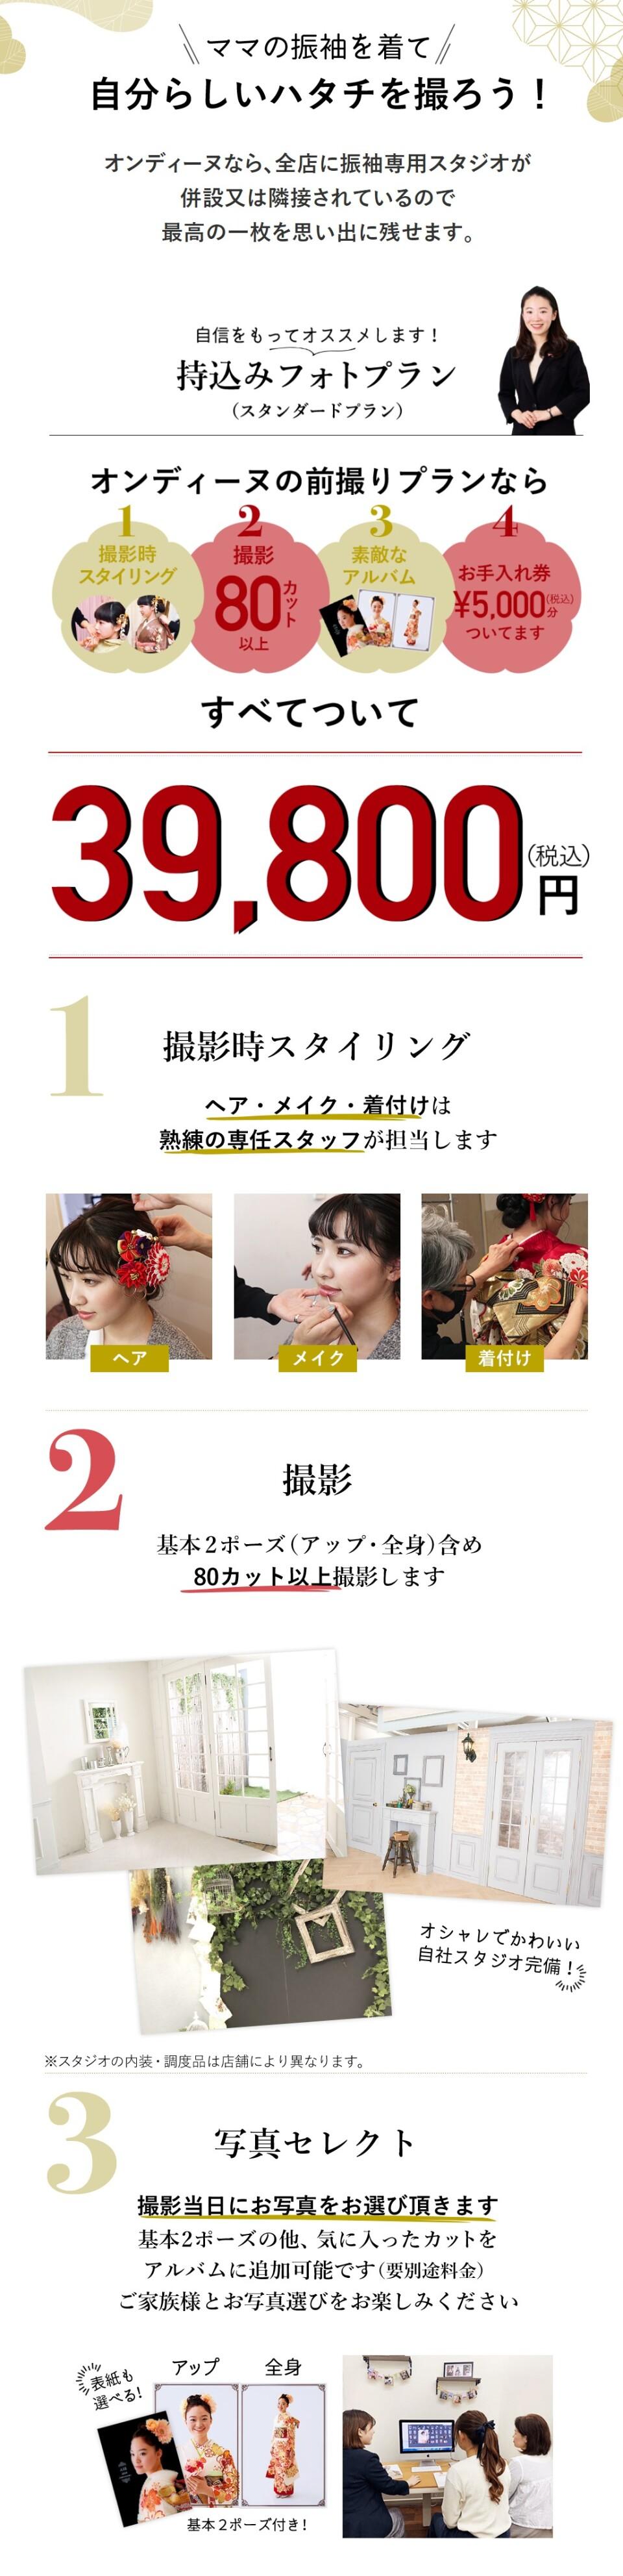 FireShot Capture 4896 - ママの振袖もオンディーヌにおまかせ!|成人式の振袖レンタル・販売オンディーヌ - www.ondine.jp